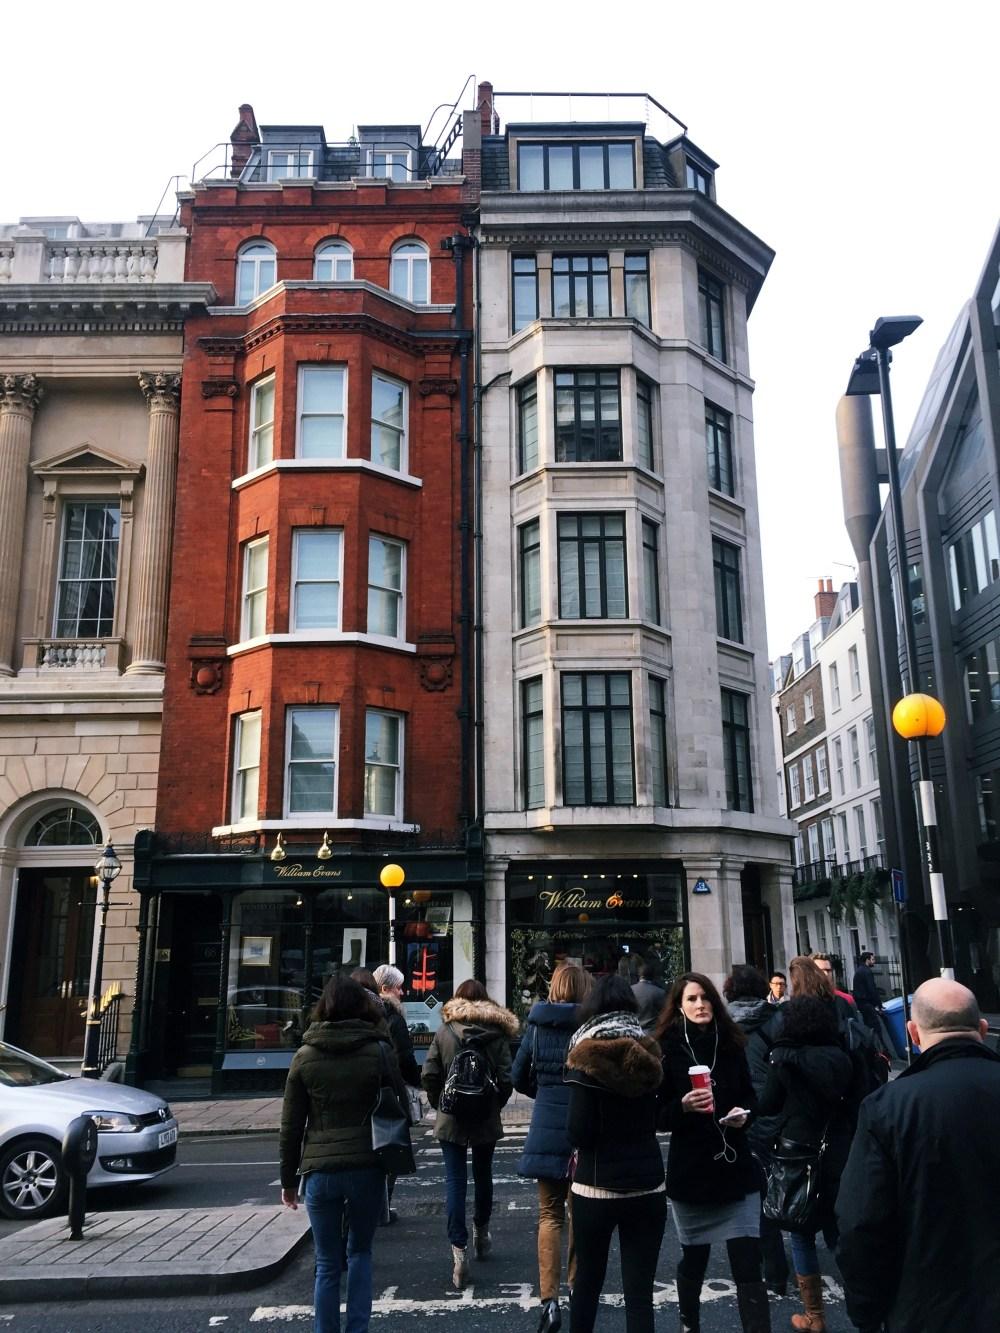 9 Dec 2016: St James's Street | London, England